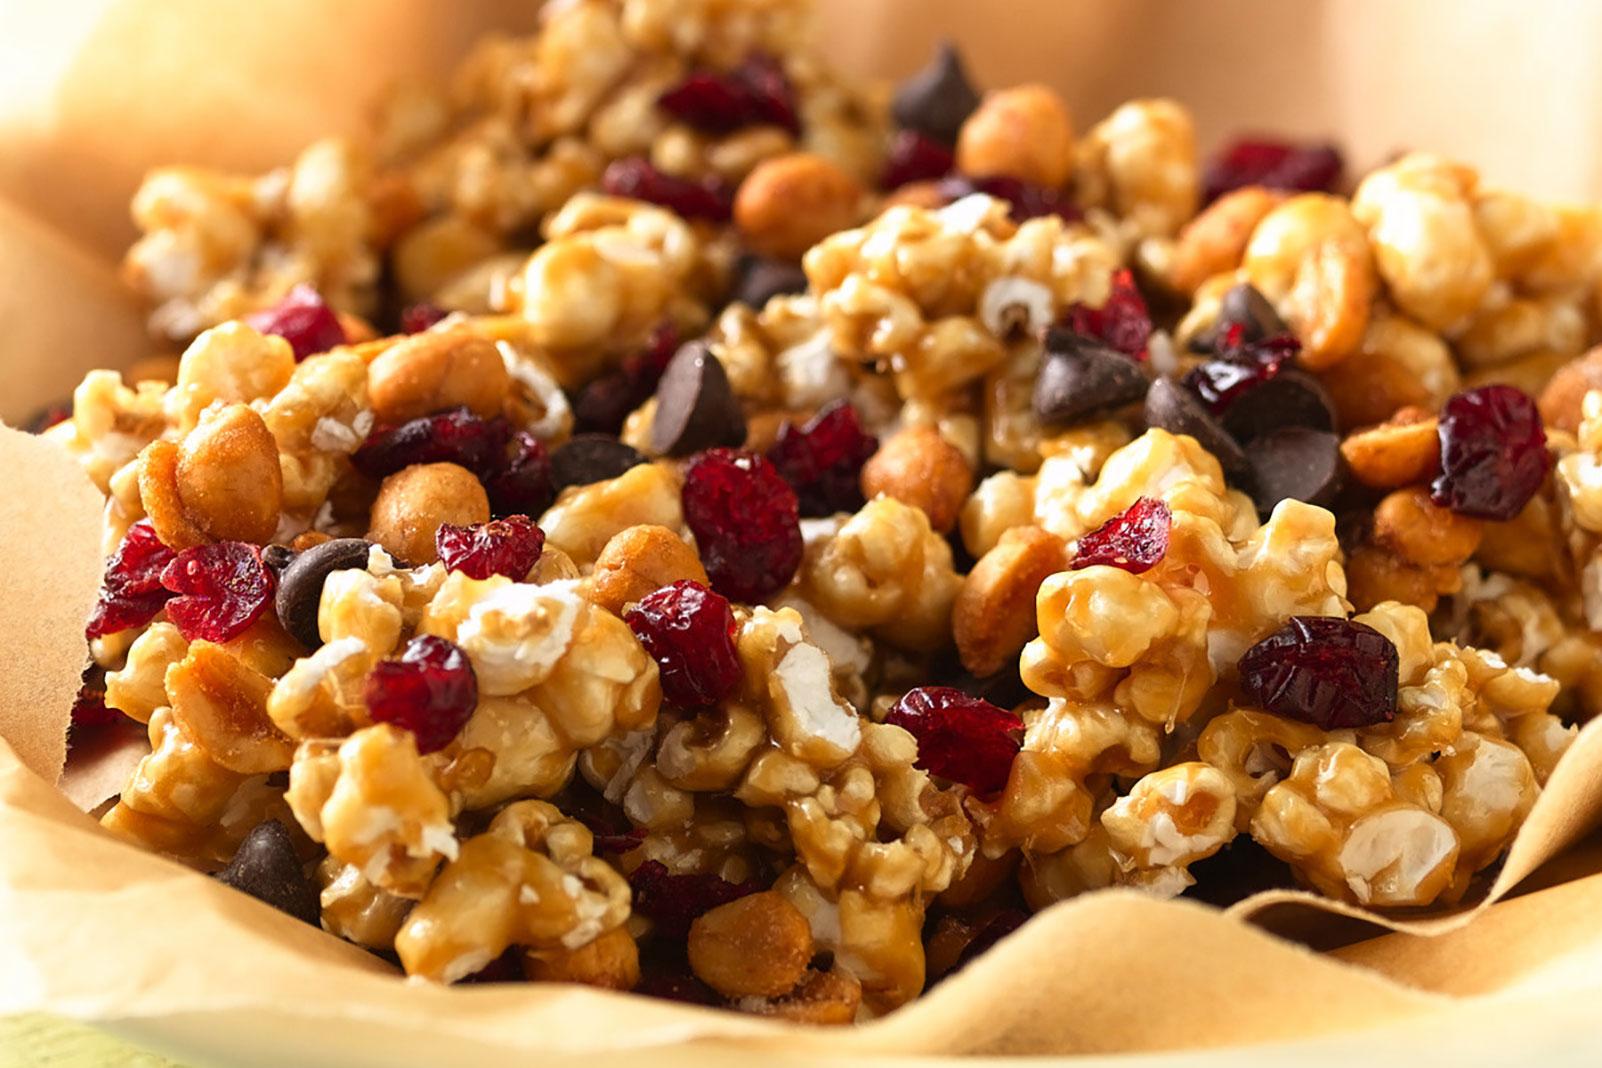 Caramel Corn & Craisins® Dried Cranberries Snack Mix